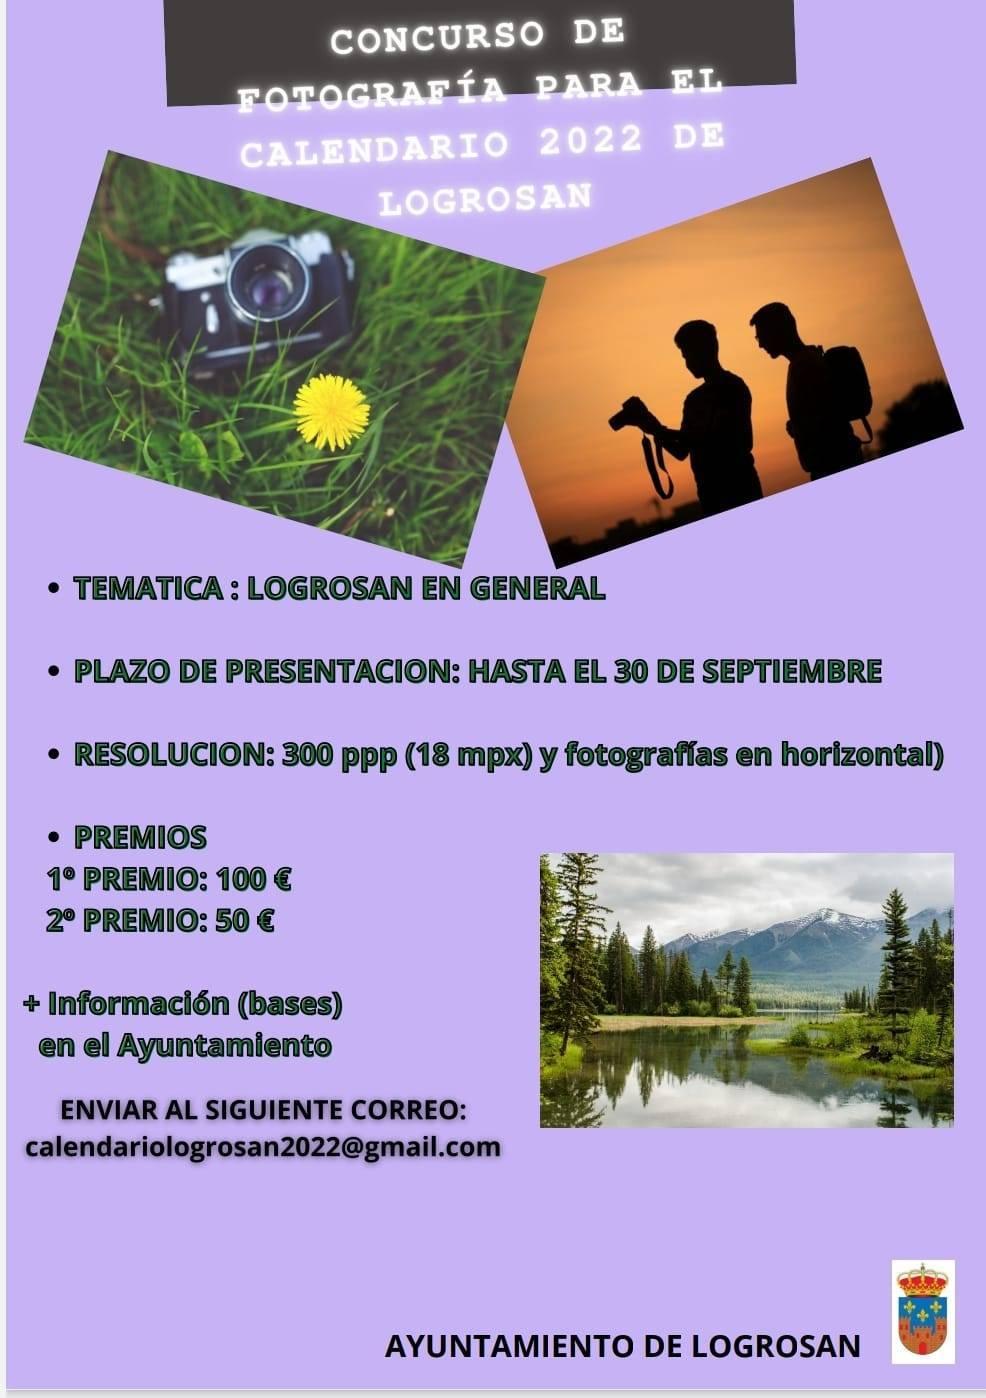 Concurso de fotografía para el calendario anual (2021) - Logrosán (Cáceres)